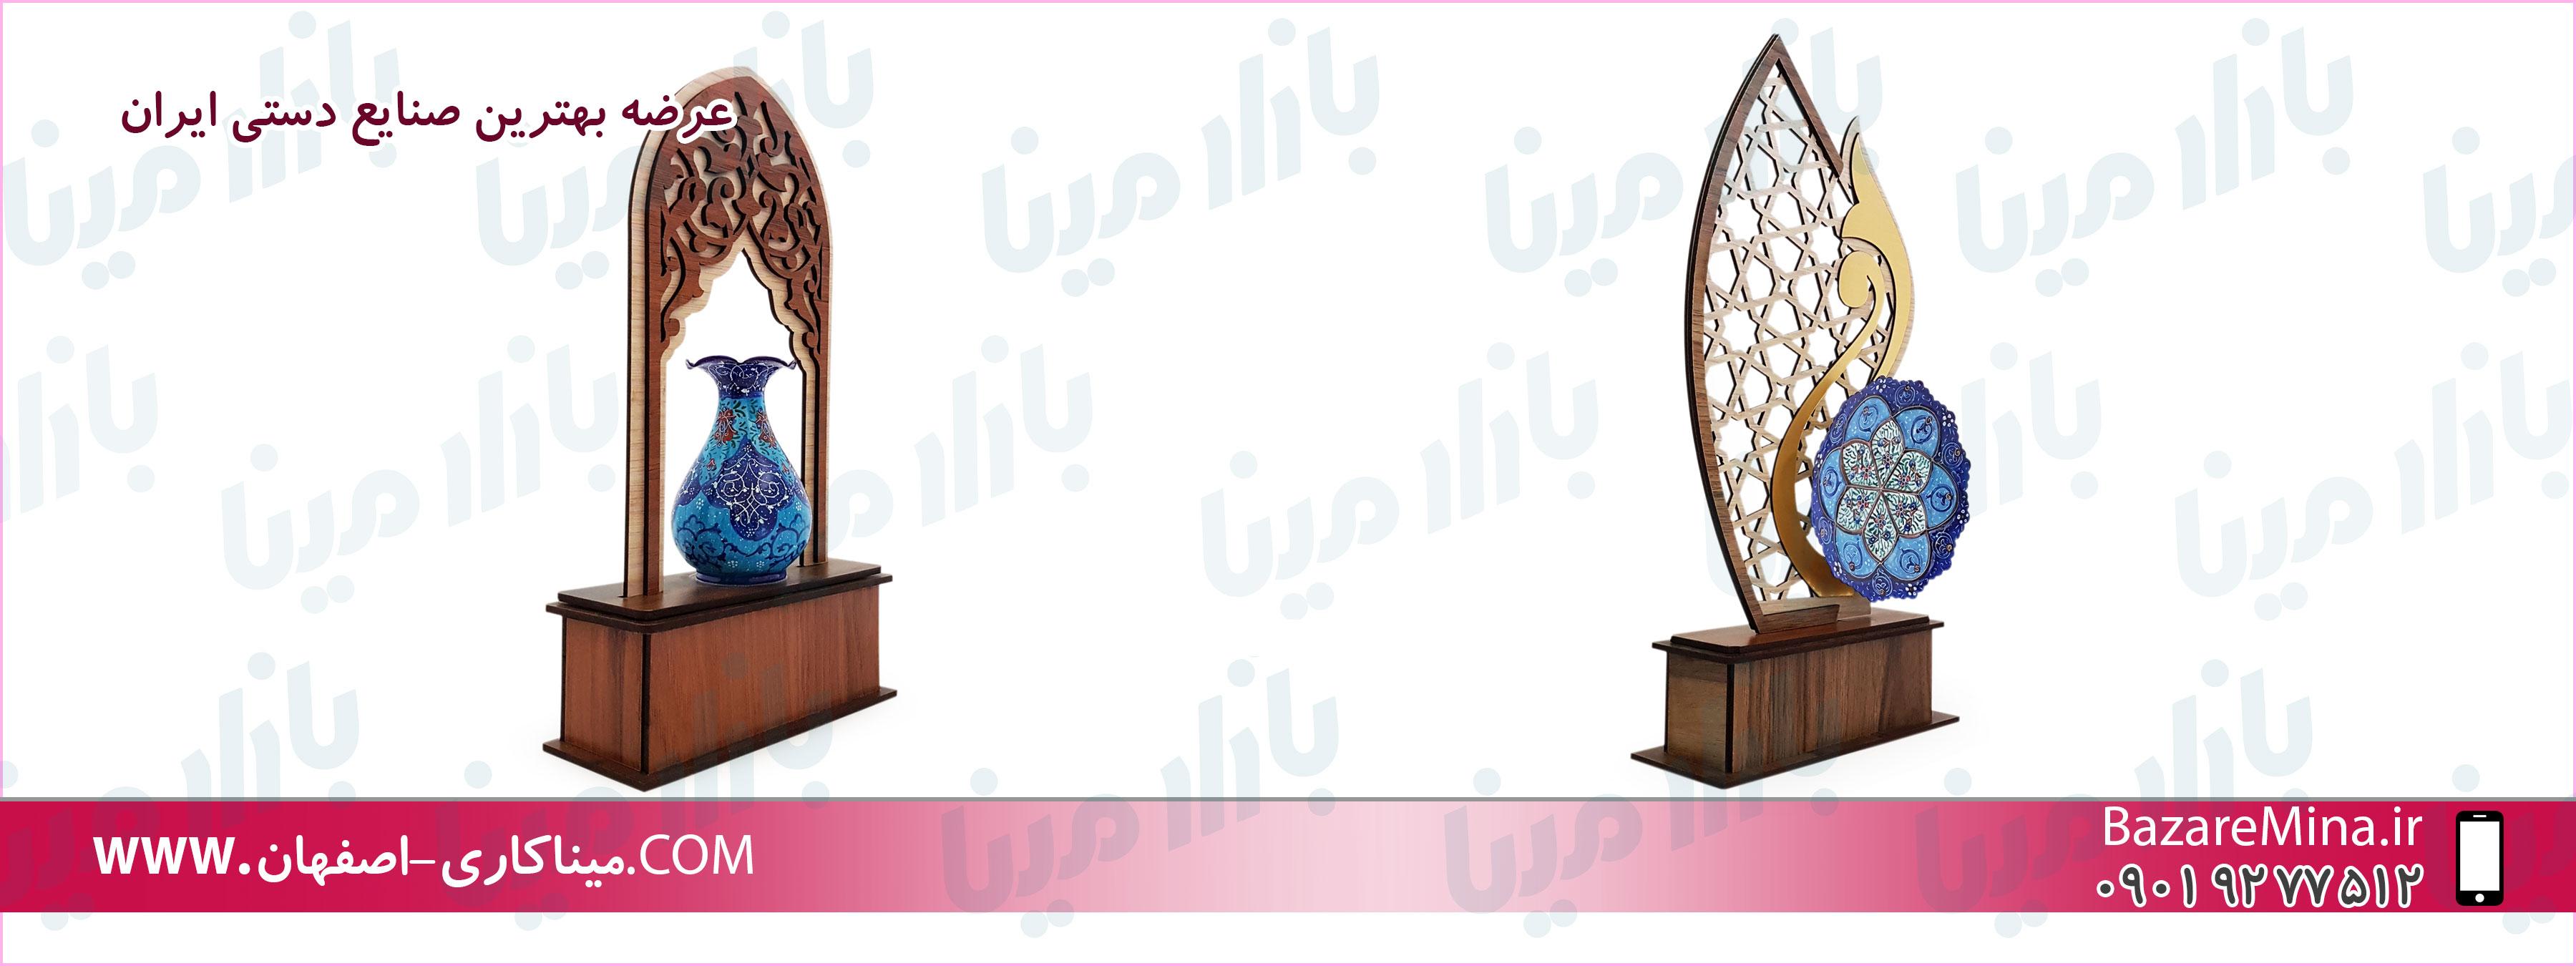 میناکاری مس اصفهان